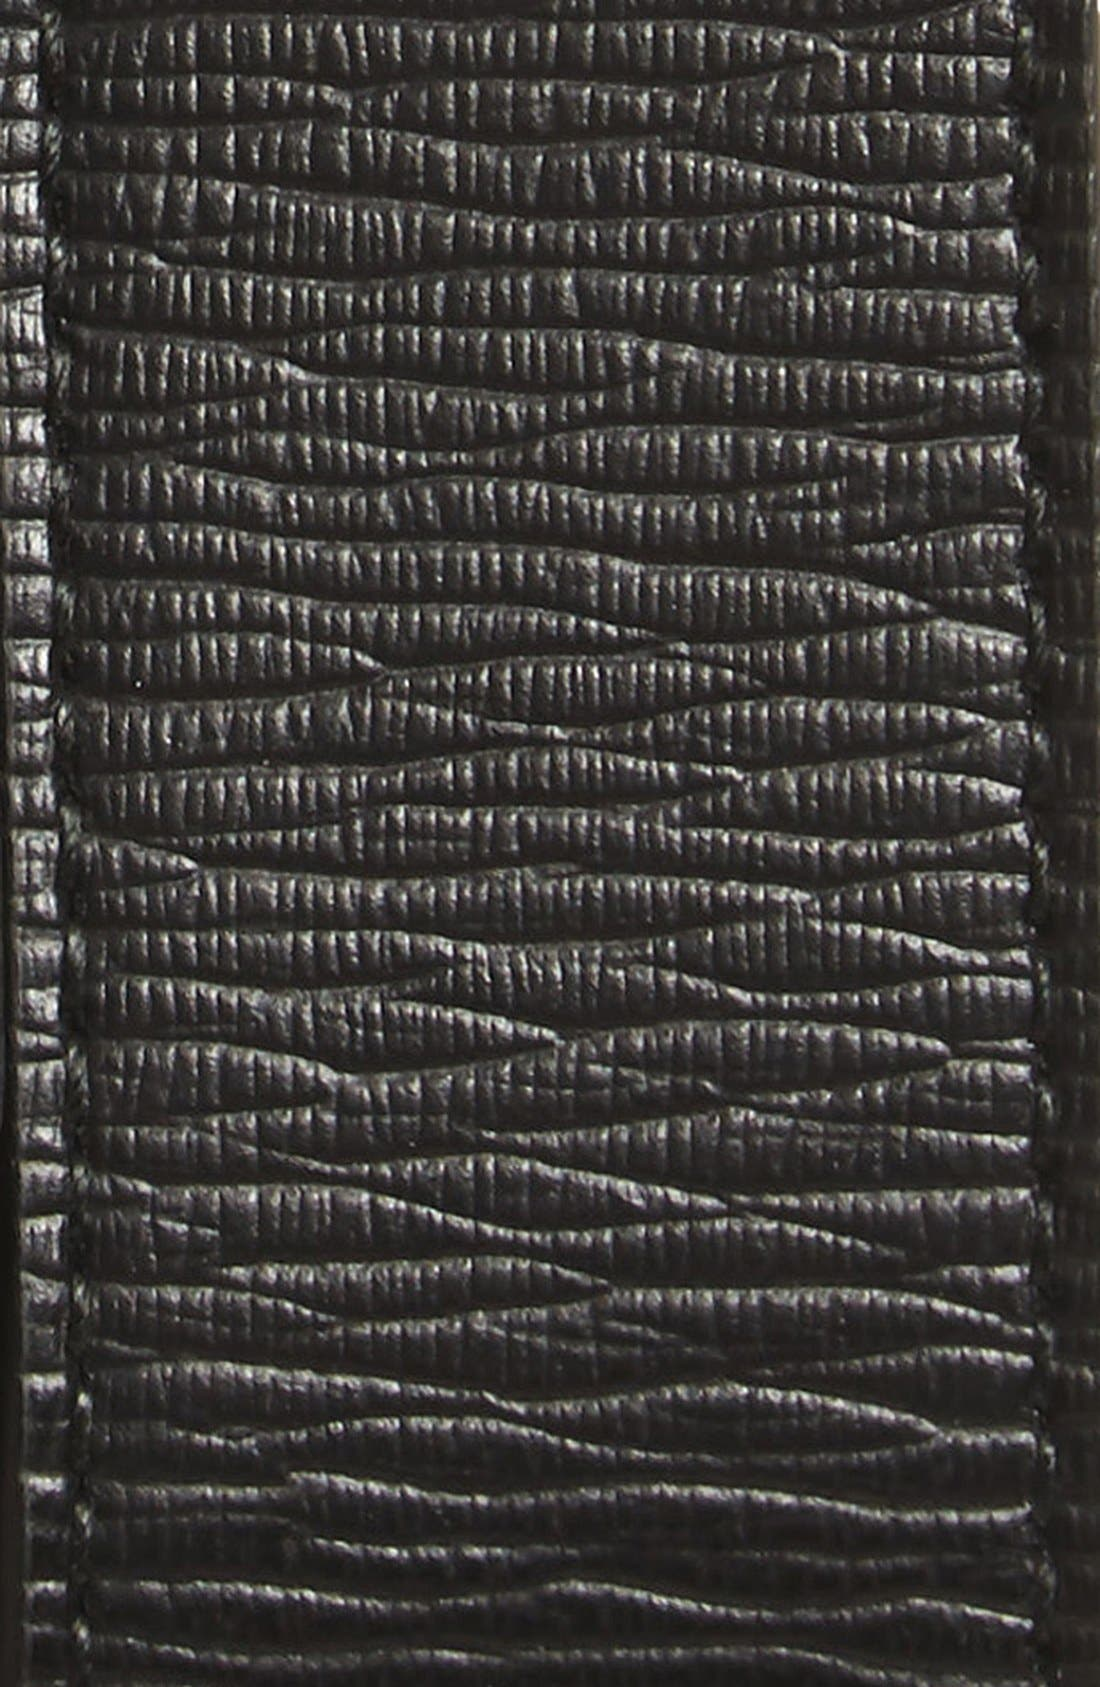 Revival Reversible Leather Belt,                             Alternate thumbnail 4, color,                             BLACK/BROWN